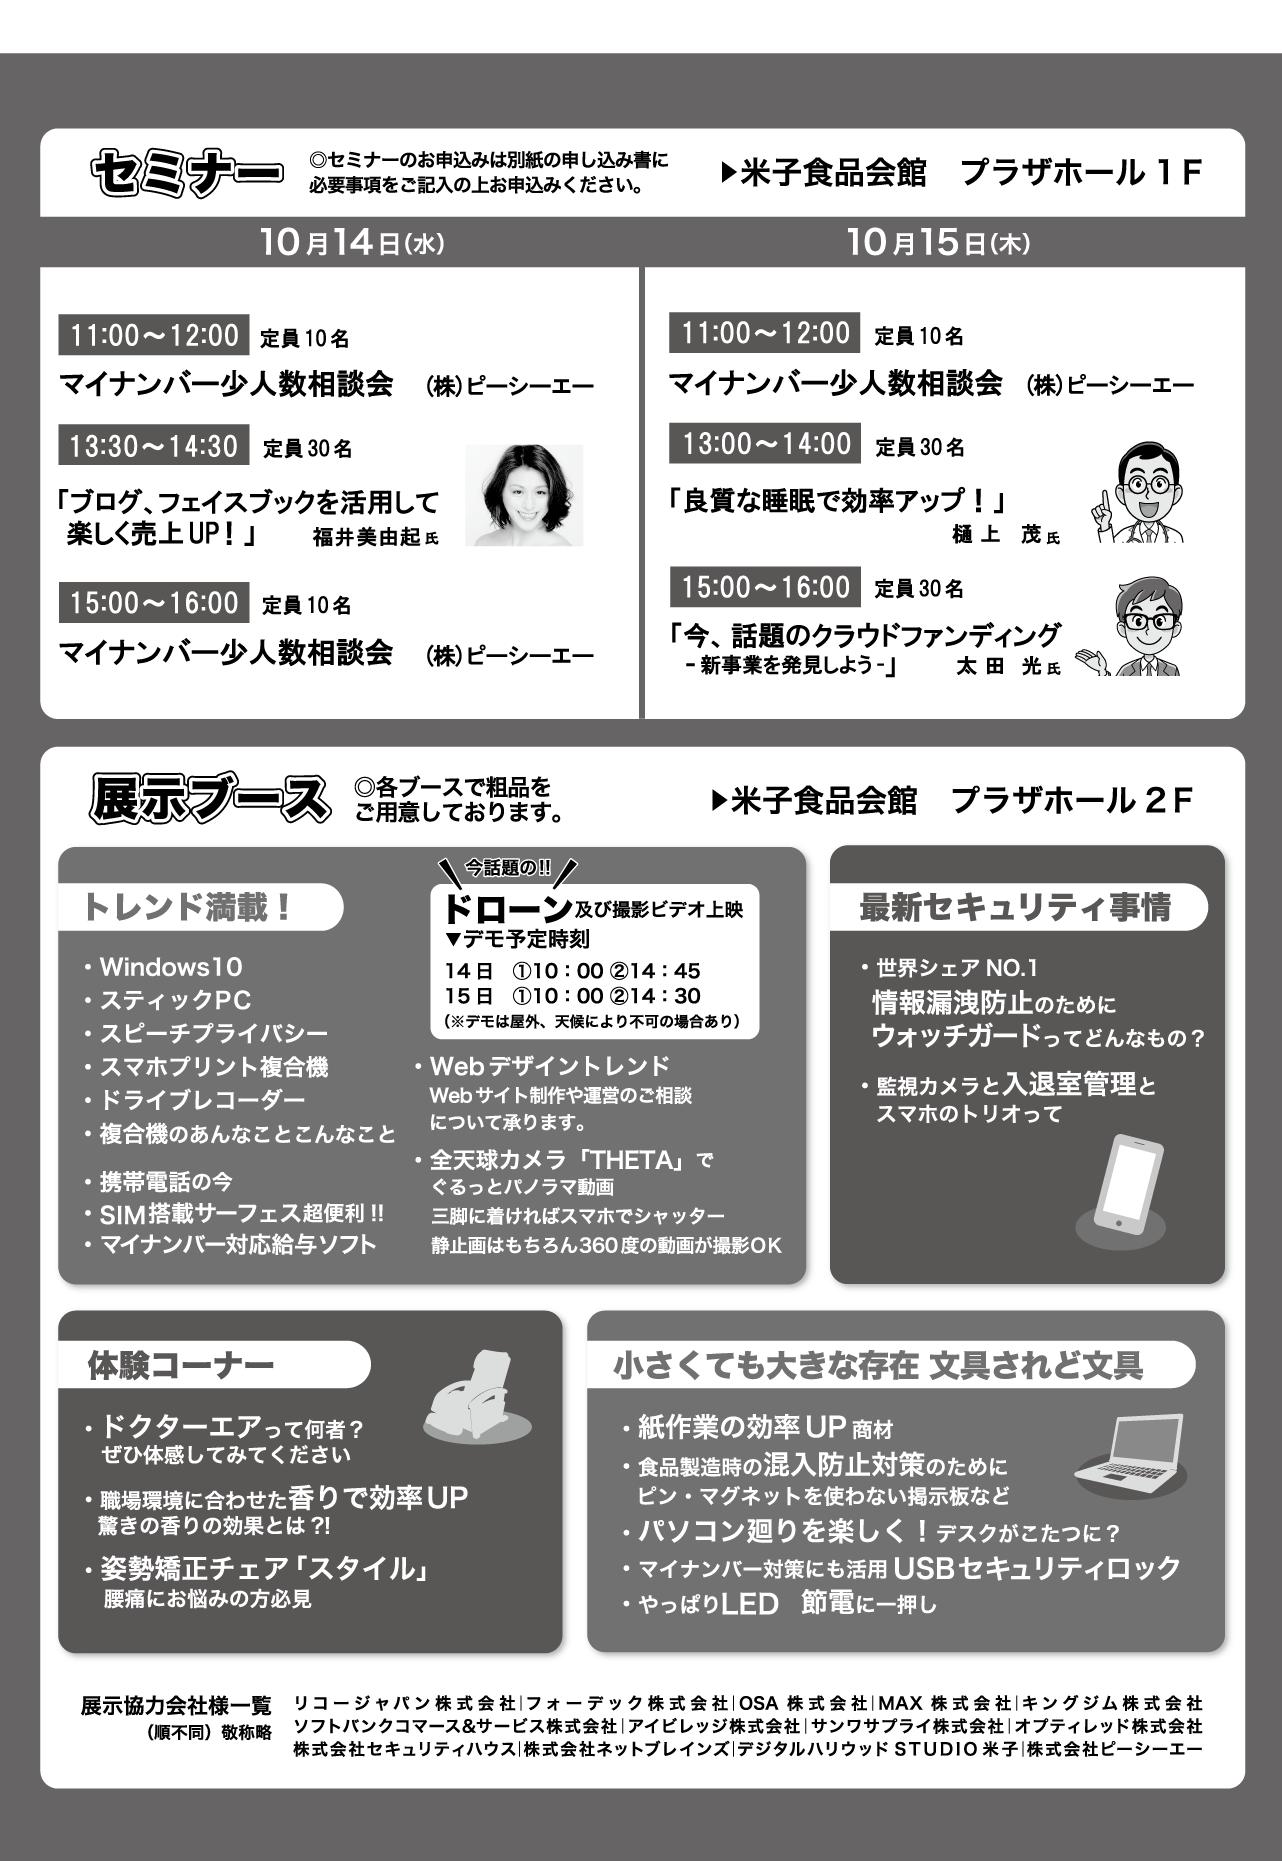 fukui_A4_ura_02_ol